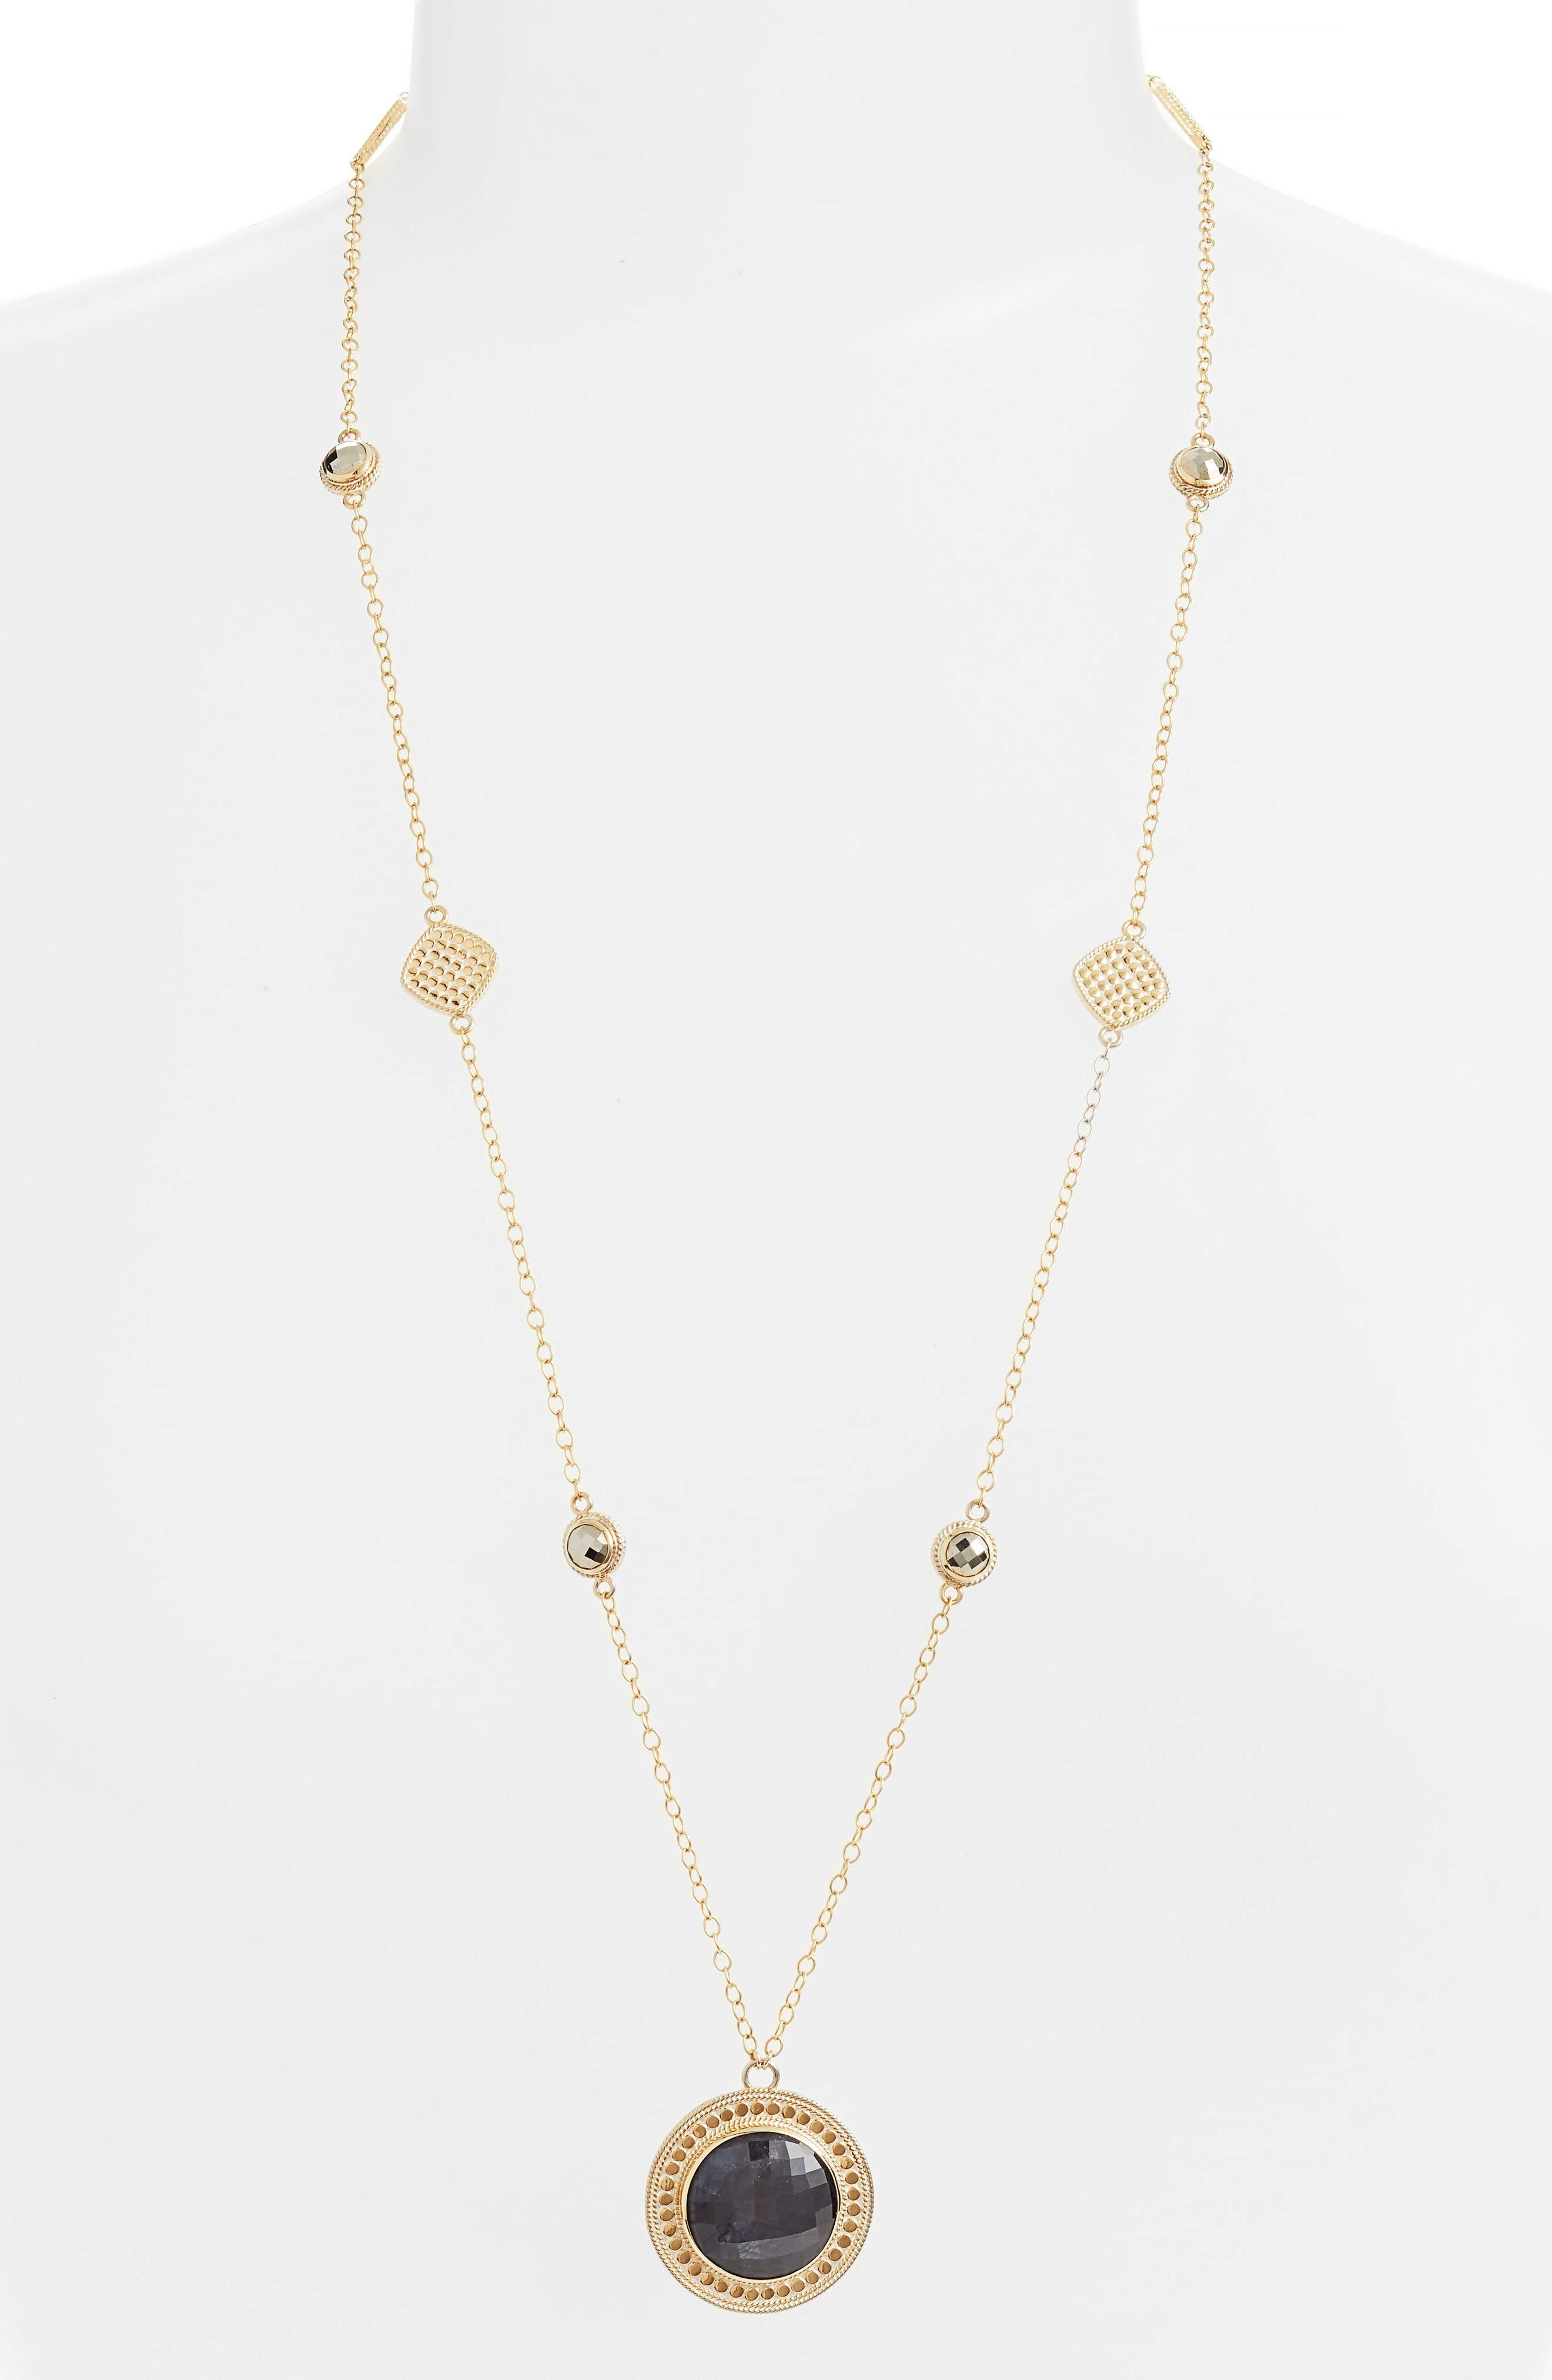 Grey Sapphire & Pyrite Long Pendant Necklace,                         Main,                         color, Gold/ Silver/ Grey/ Pyrite